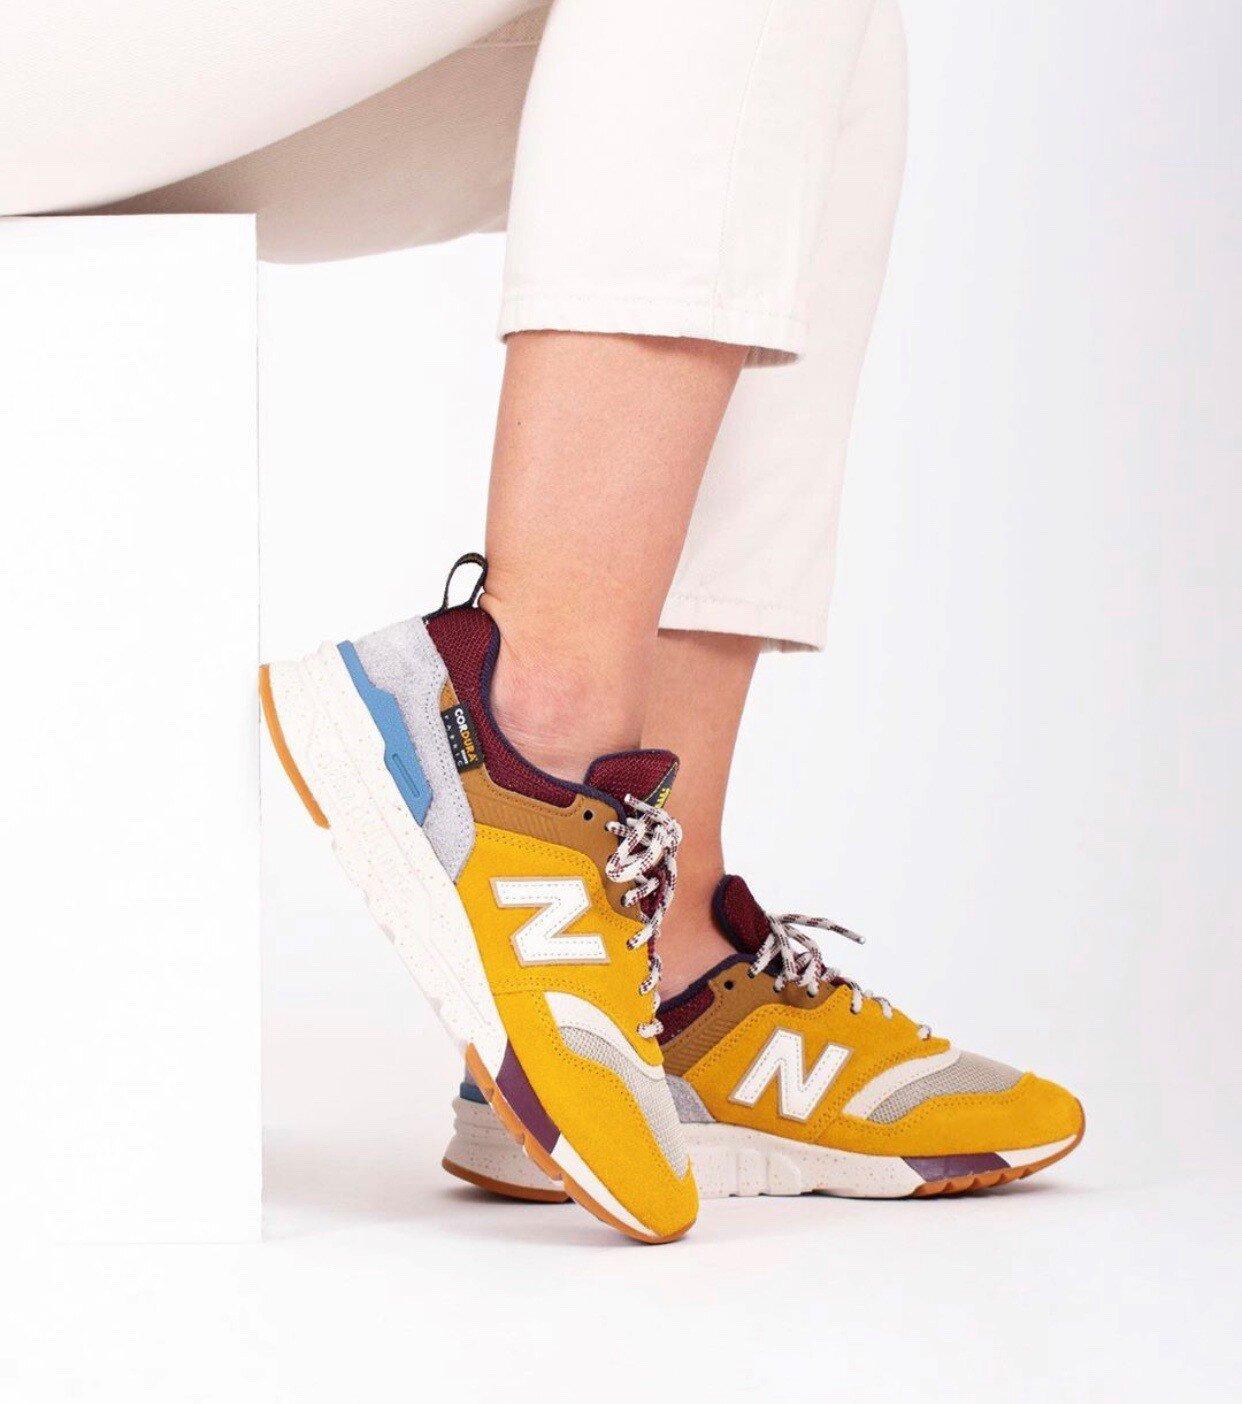 Sabueso obtener Ananiver  Wish List: New Balance 997 HXE — CNK Daily (ChicksNKicks)